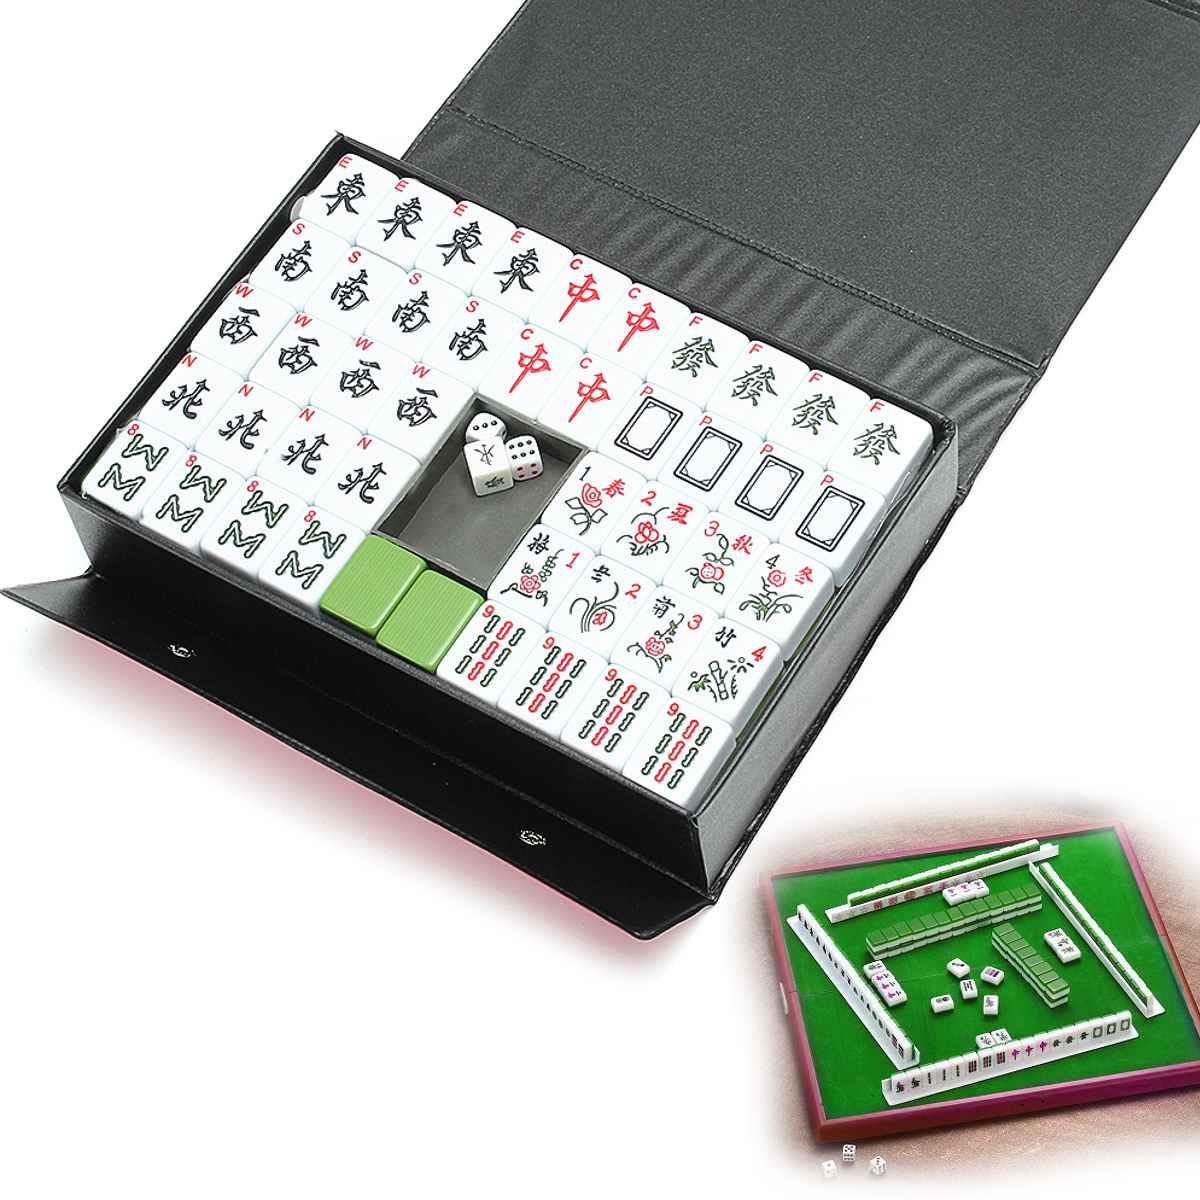 144 Tiles Portable Chinese MahJong Rare Game Set Retro Mah Jong + Custom Fit Box Entertainment Fun Family Board Games